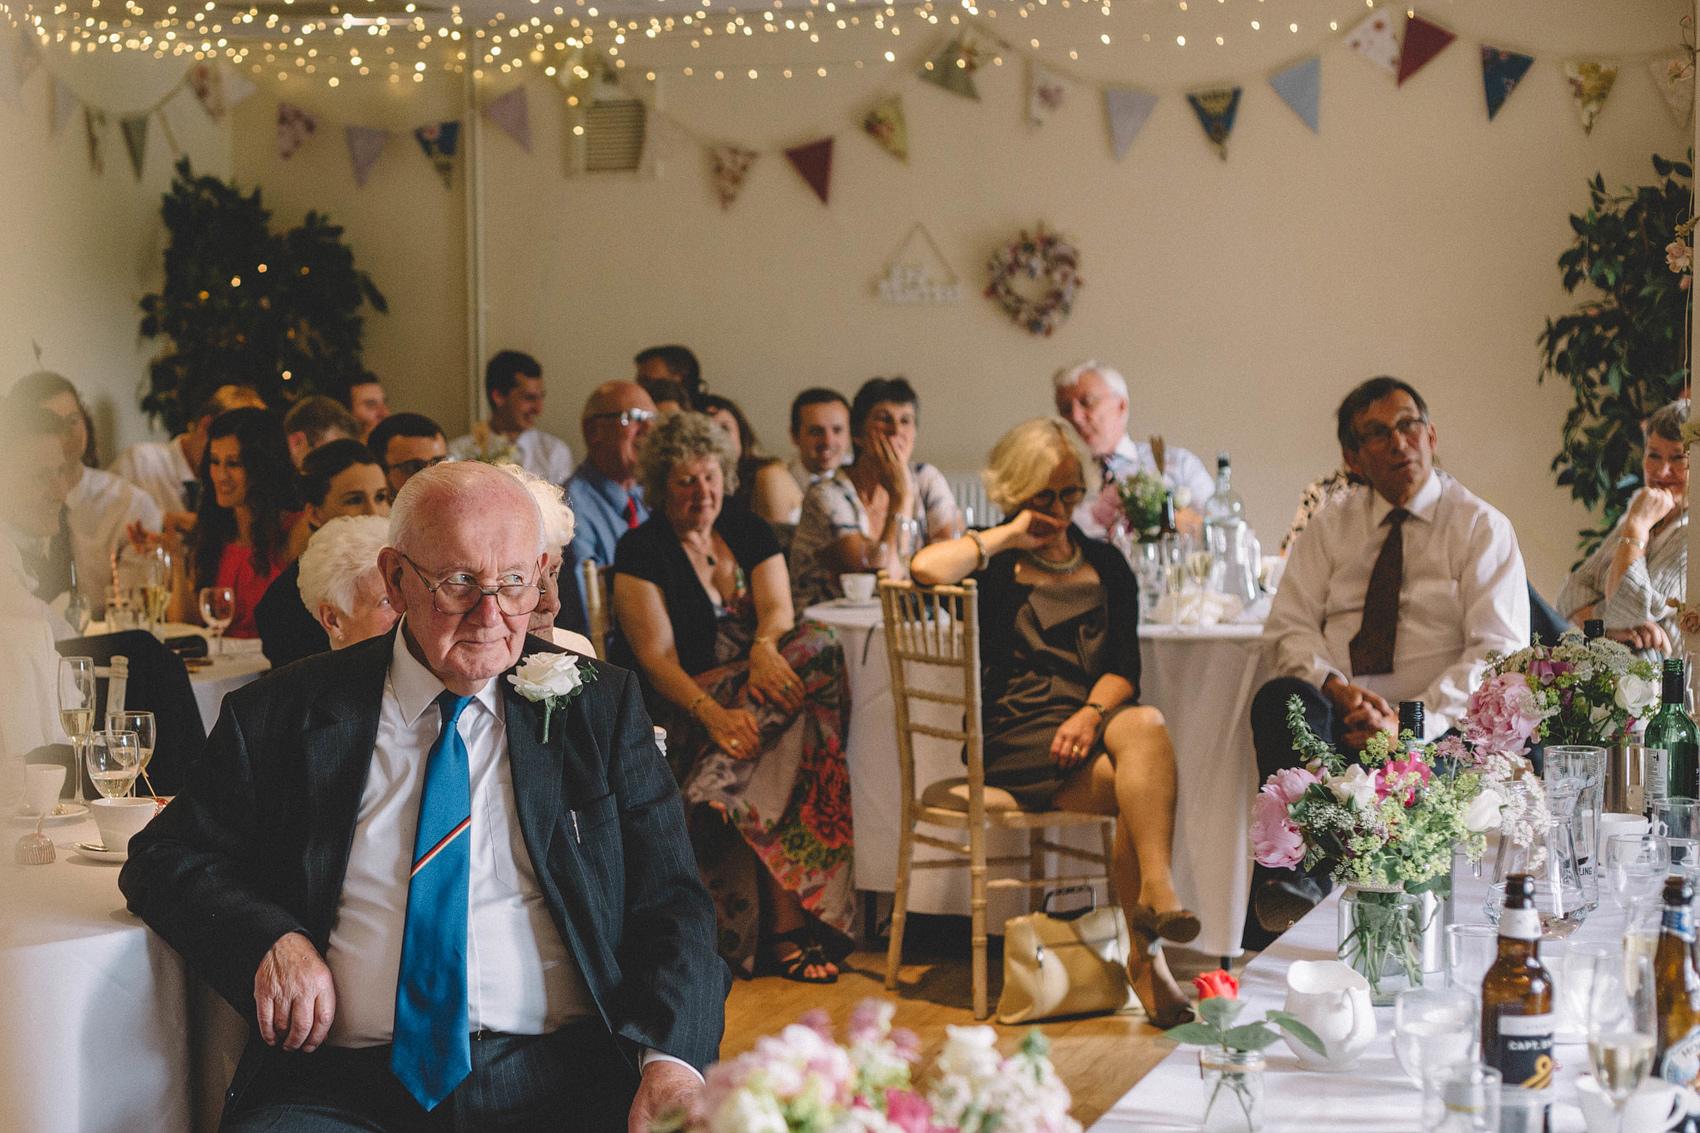 Dilhorne_Village_Hall_Wedding_Photography_-_73_.jpg